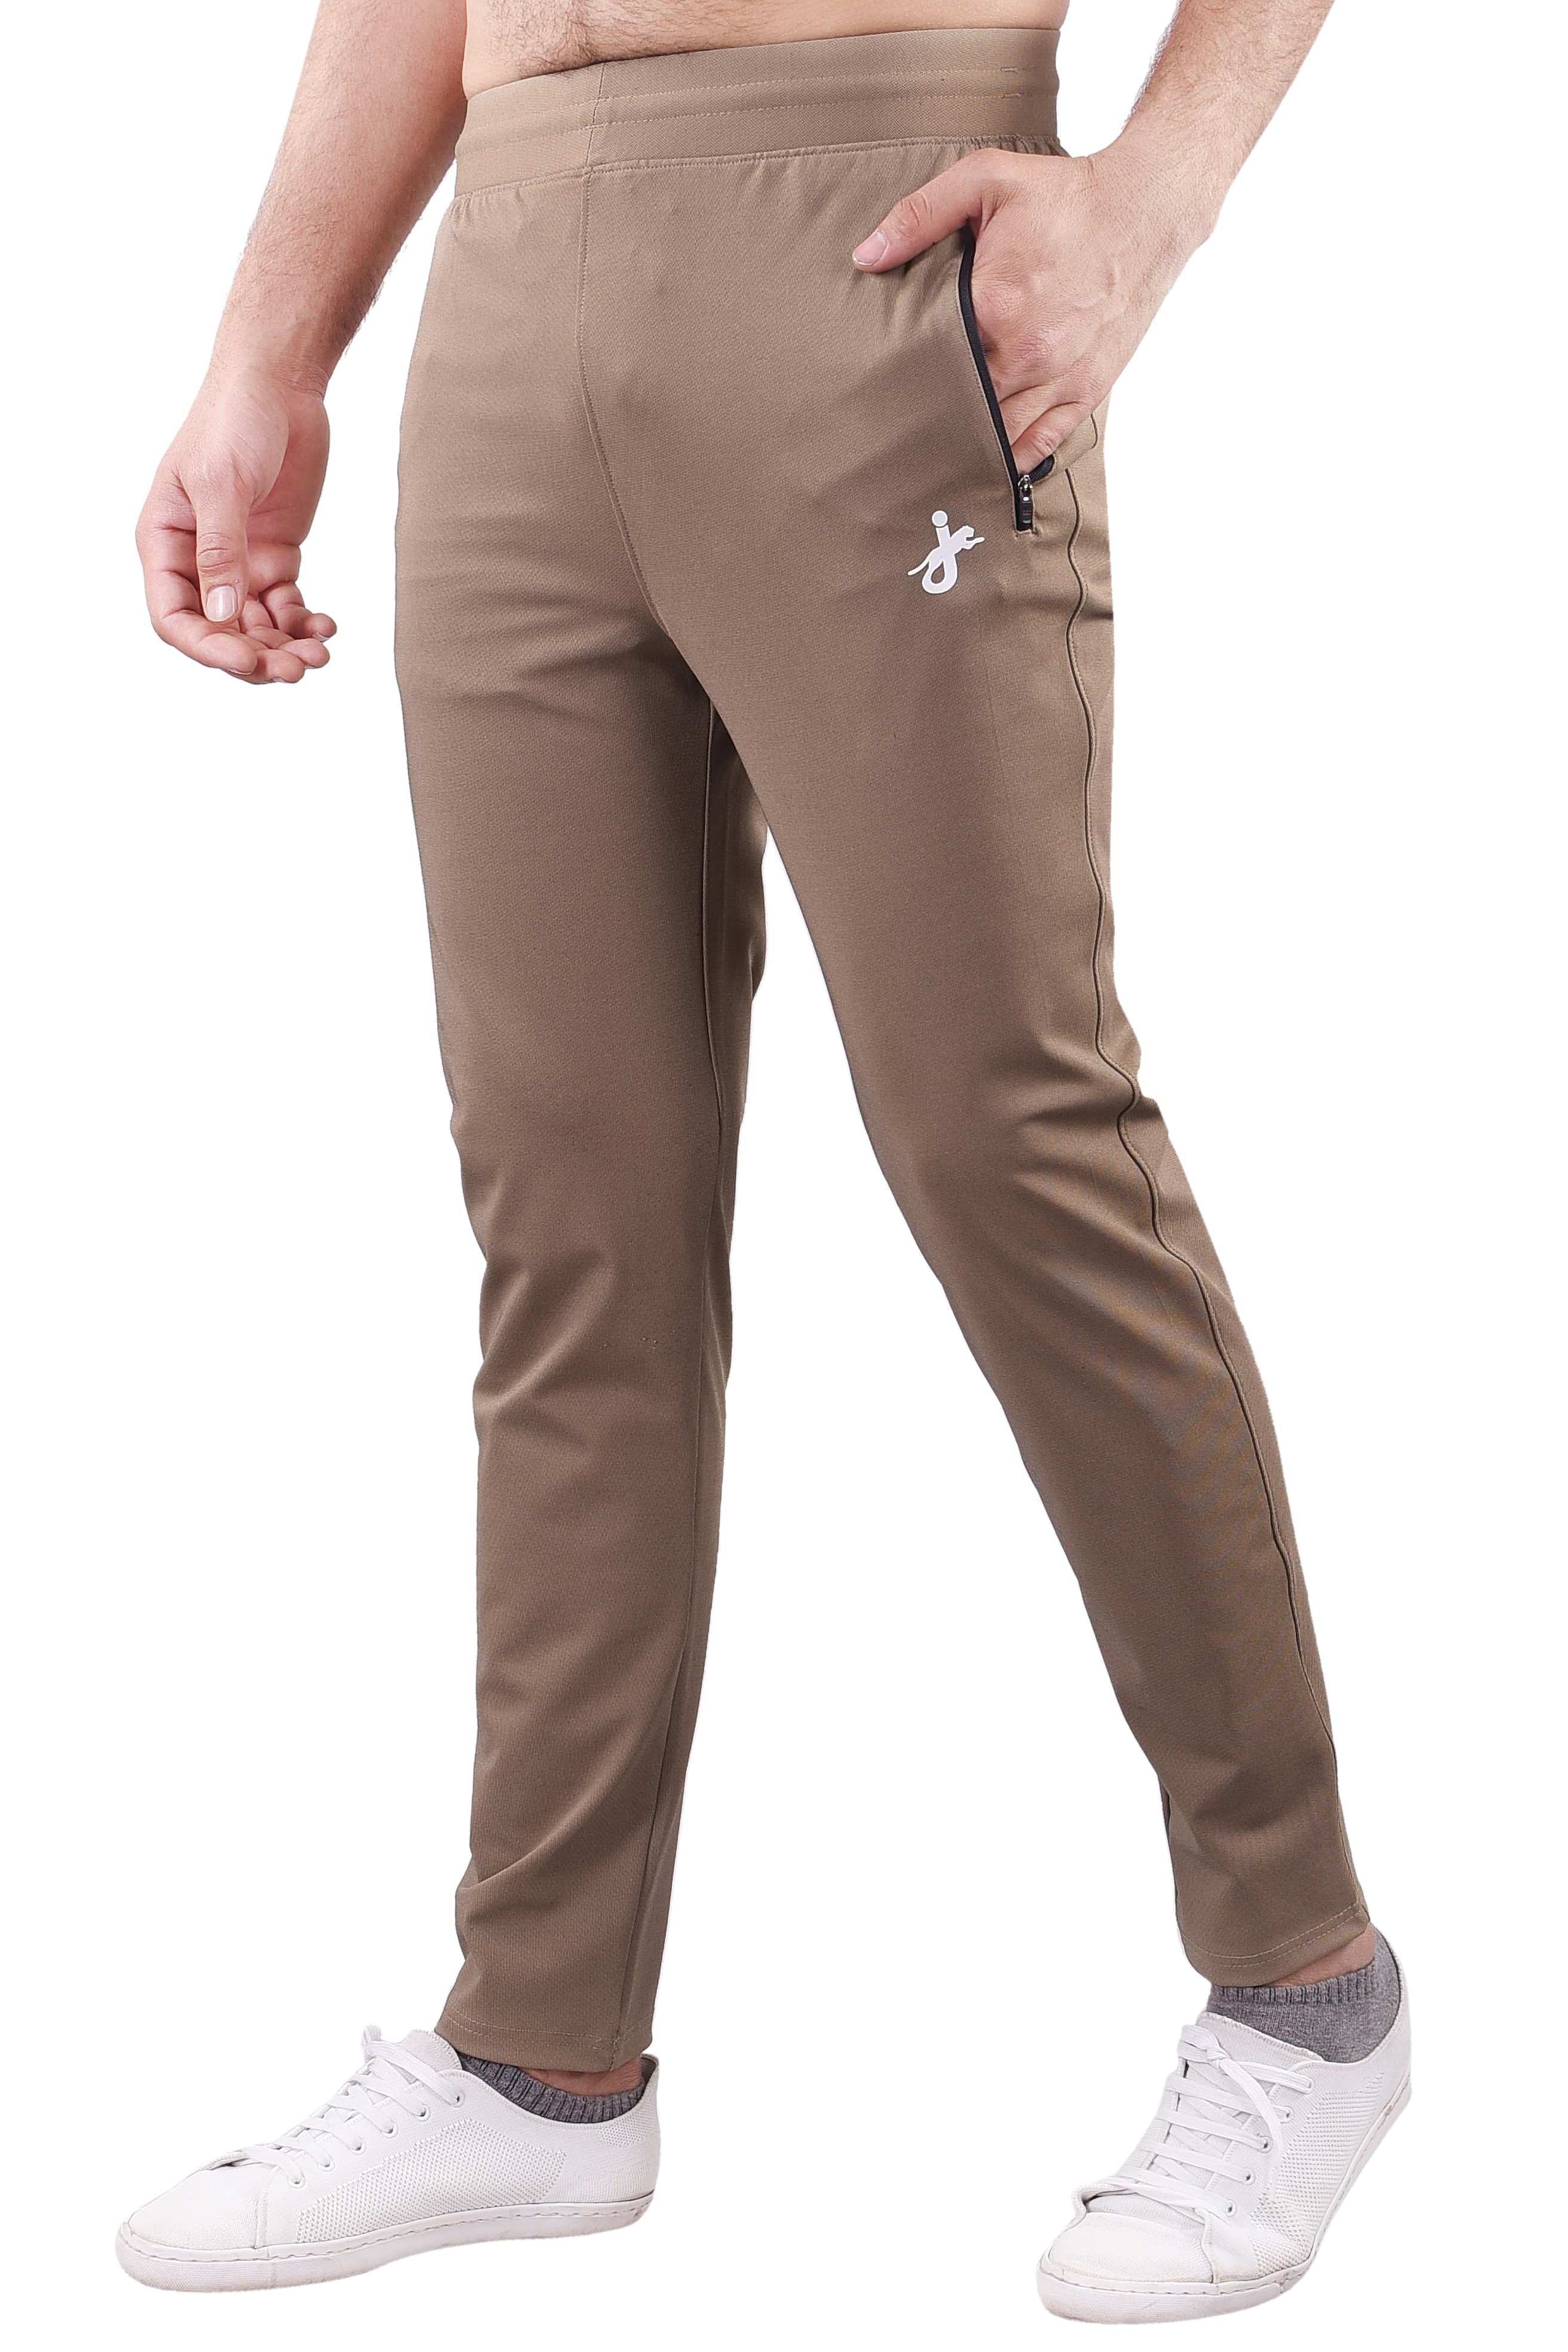 JAGURO | JAGURO Men's Polyester Solid Beige Casual Track-Pant.